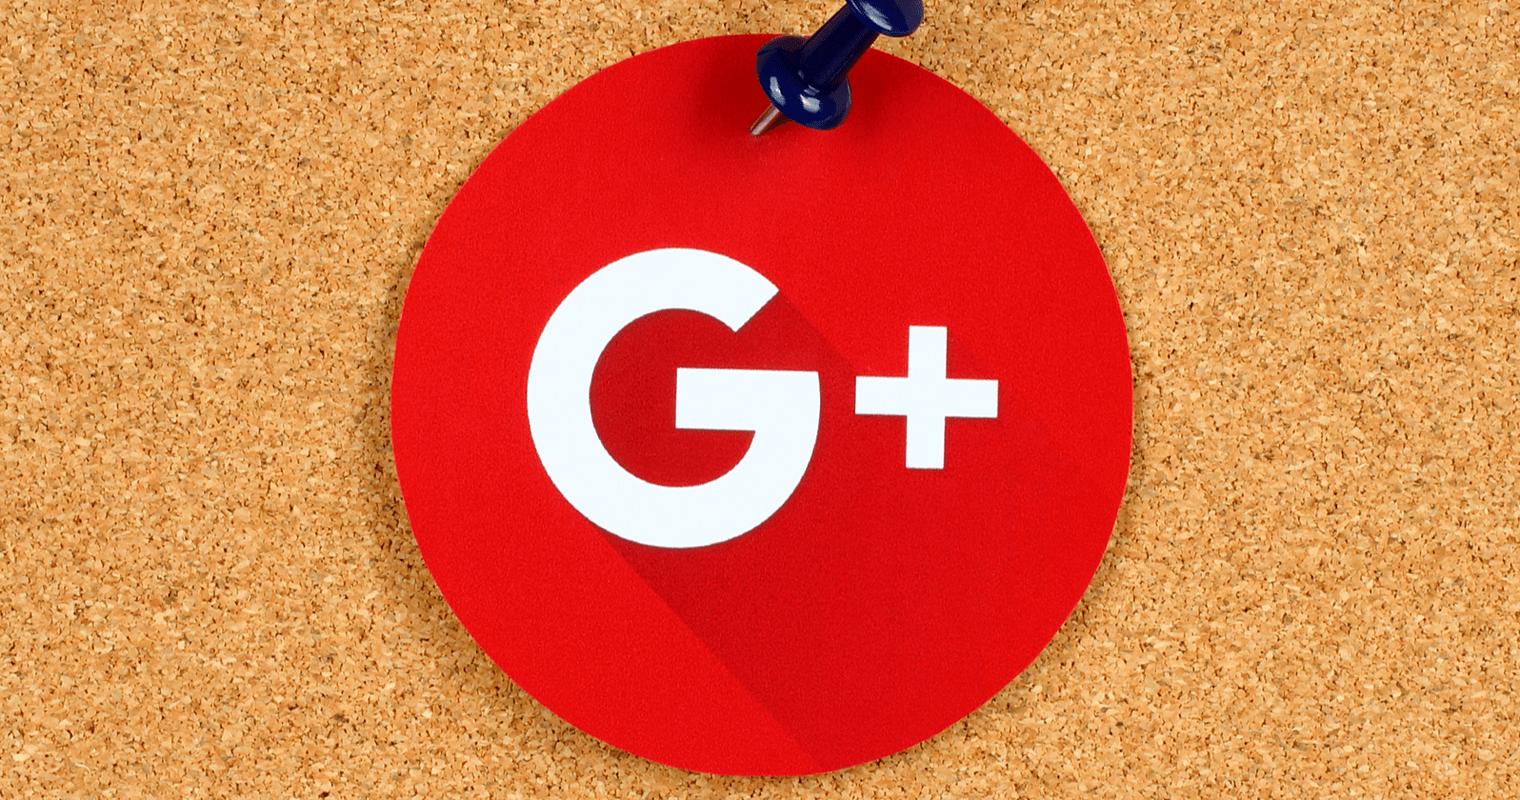 Google is Shutting Down Google+, Admits Low Consumer Adoption